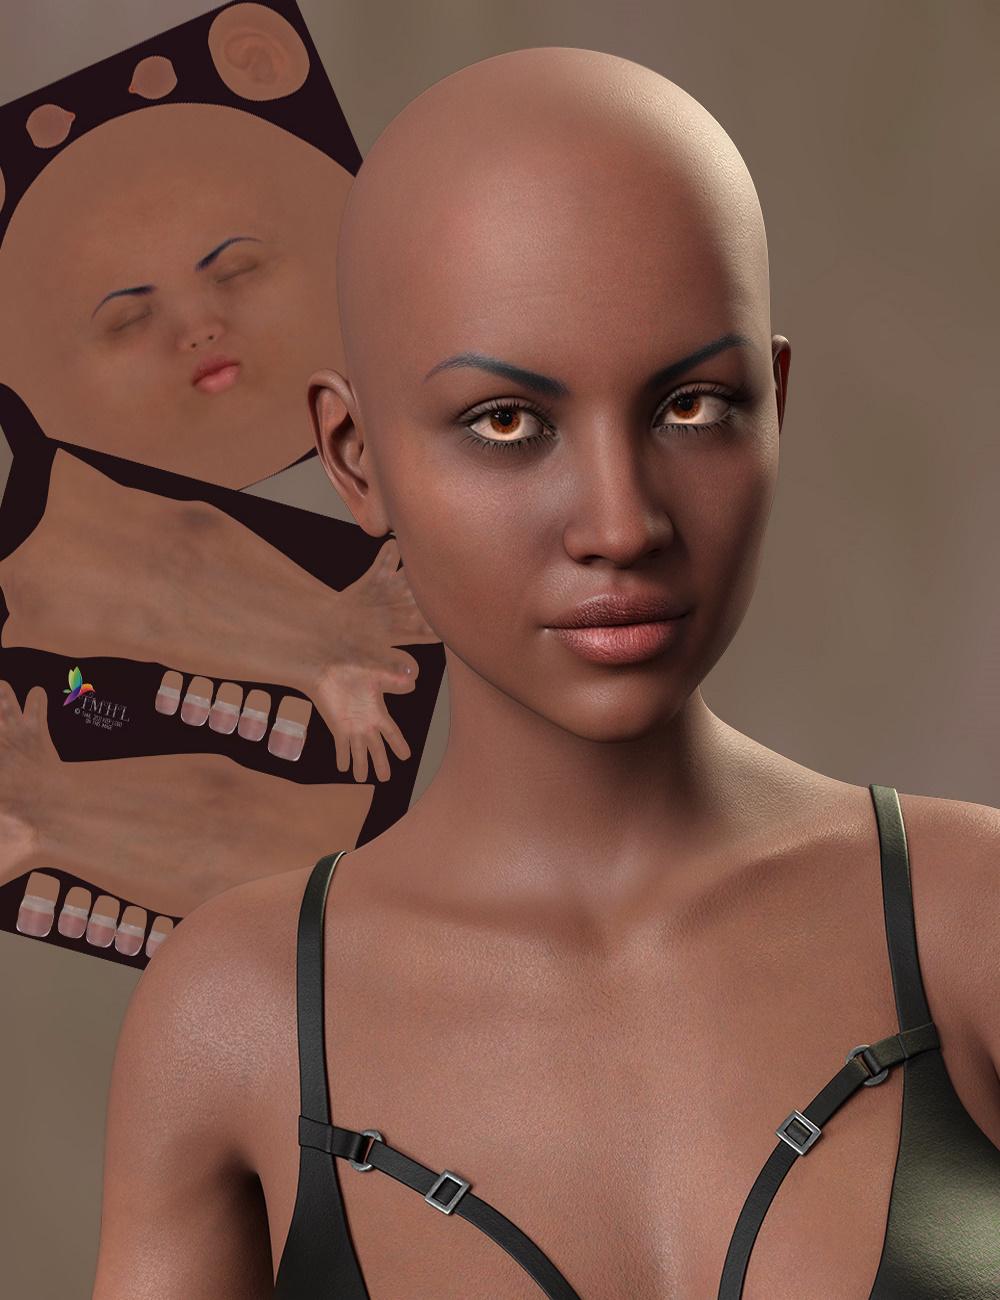 TMHL Dark Skin Merchant Resource for Genesis 8.1 Female by: TwiztedMetal, 3D Models by Daz 3D